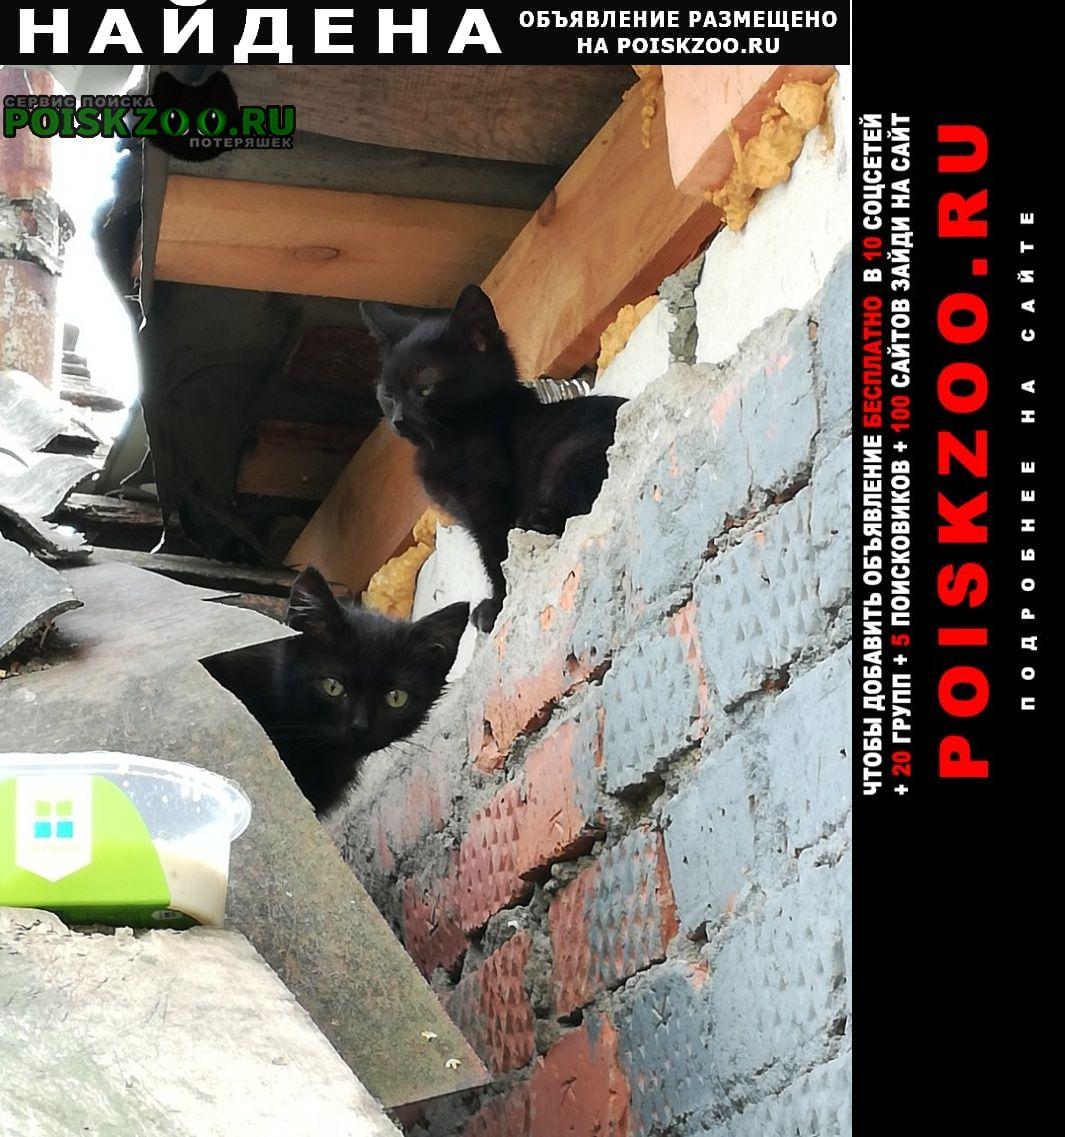 Найдена кошка ищем дом Коломна